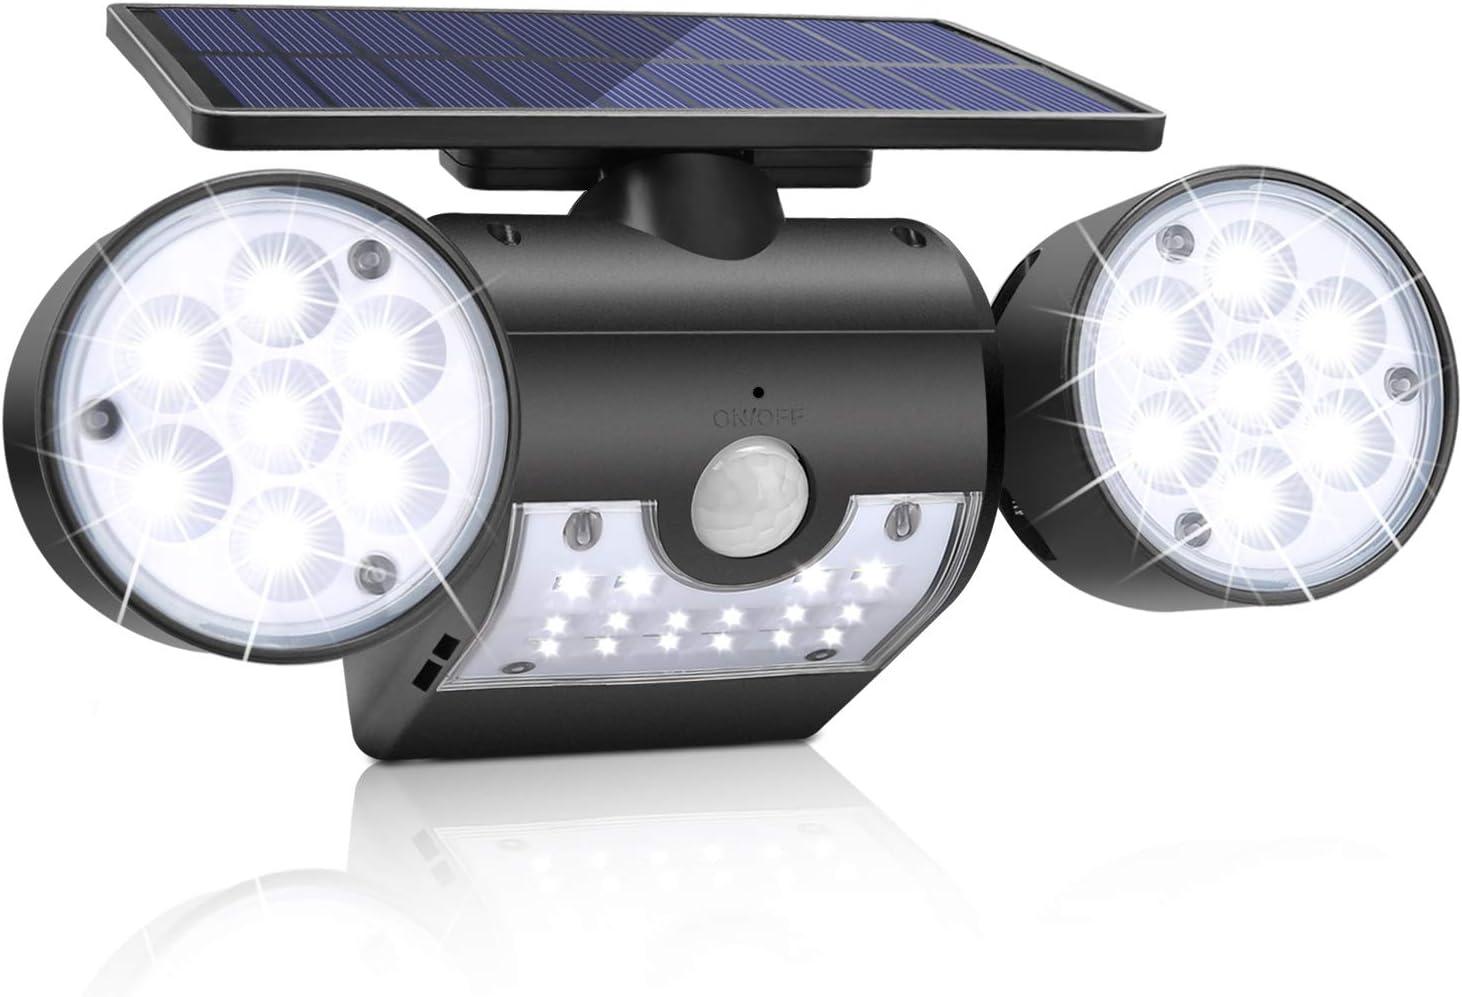 Solar Lights Outdoor,KeShi Solar Security Lights with Motion Sensor 360° Adjustable Dual Head Spotlights, IP65 Waterproof, Rotatable Solar Motion Security Night Lights for Outdoor Pation Yard Garden